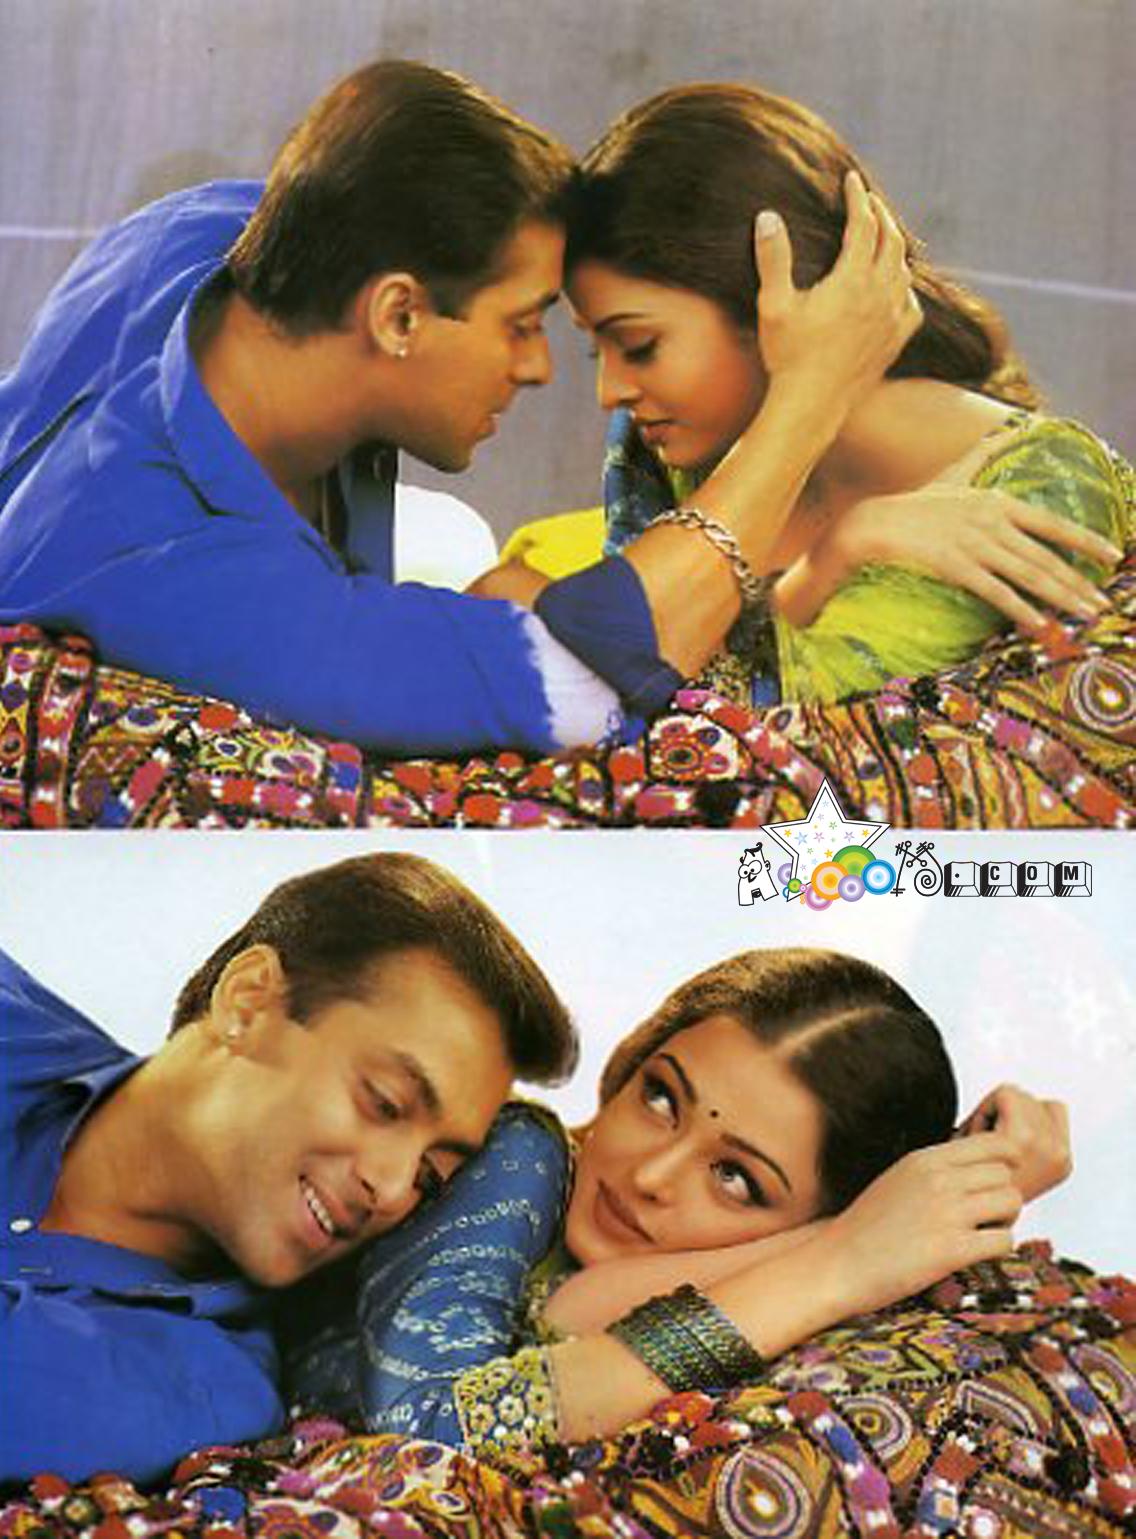 http://3.bp.blogspot.com/-atnBK5EZfjY/TilTtEVxoYI/AAAAAAAAAb4/yRz7k2-HBkk/s1600/Hum-Dil-De-Chuke-Sanam-36-Aishwarya-Rai-Salmaan-Khan-Ash-Aishwarya-rai-Bacchan.jpg